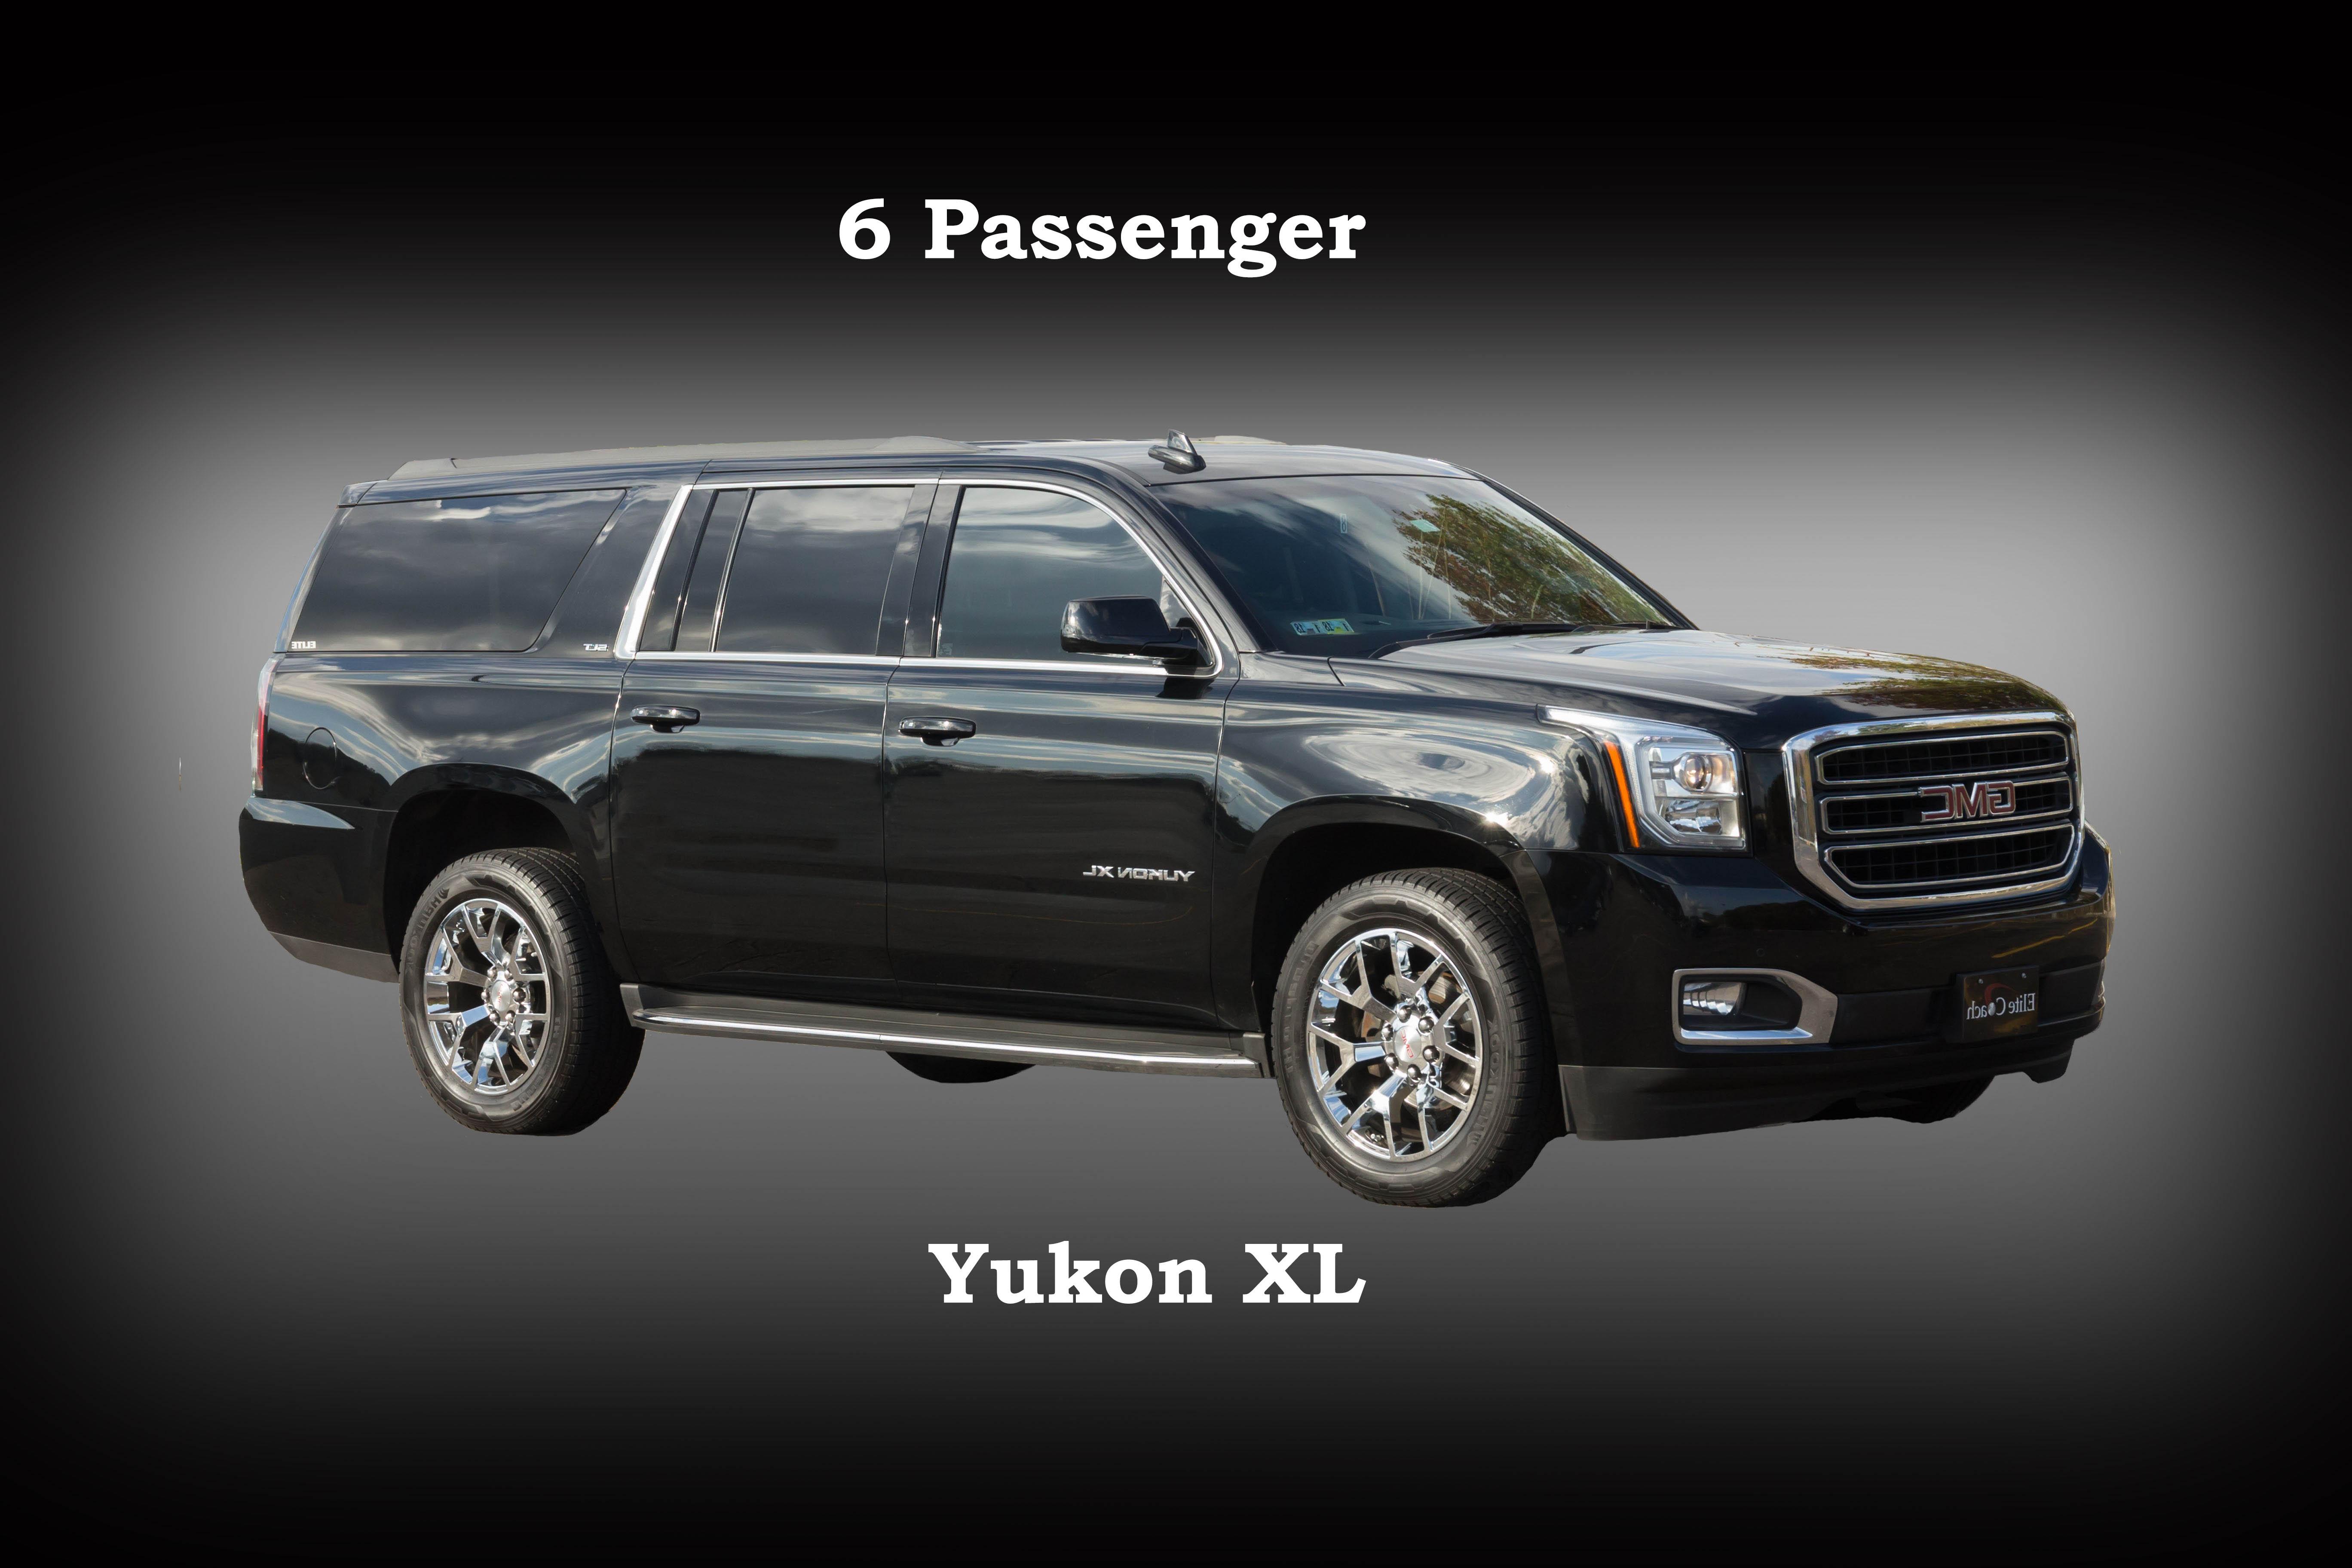 6 Passenger Suv >> Suv 8 6 Passenger Gmc Yukon Elite Transportationelite Transportation